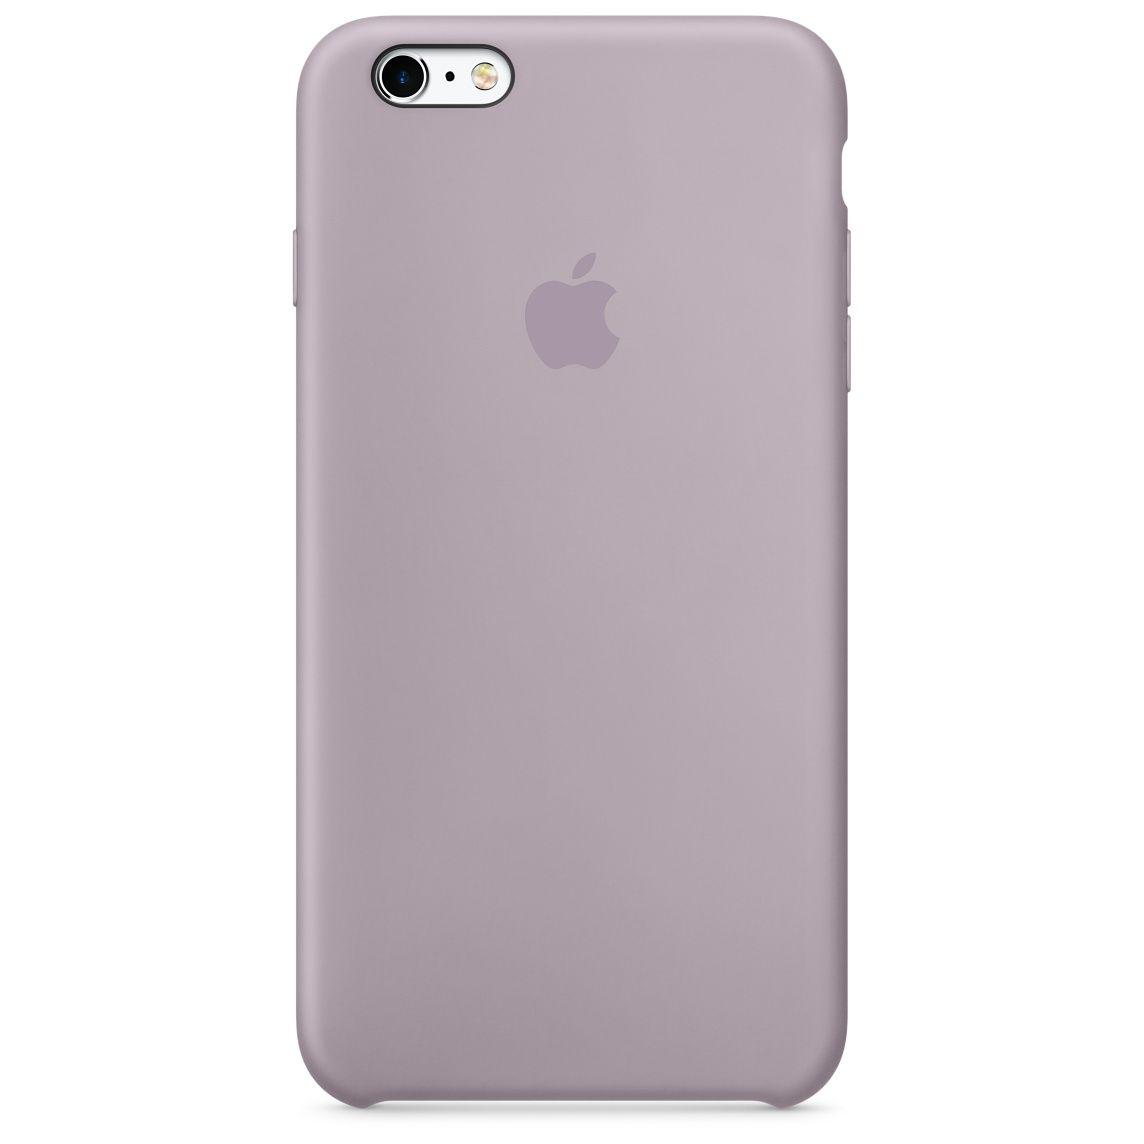 Iphone 6s Silikon Case Anthrazit Apple De Fundas Para Iphone Fundas Para Iphone 6 Fundas Para Iphone 5